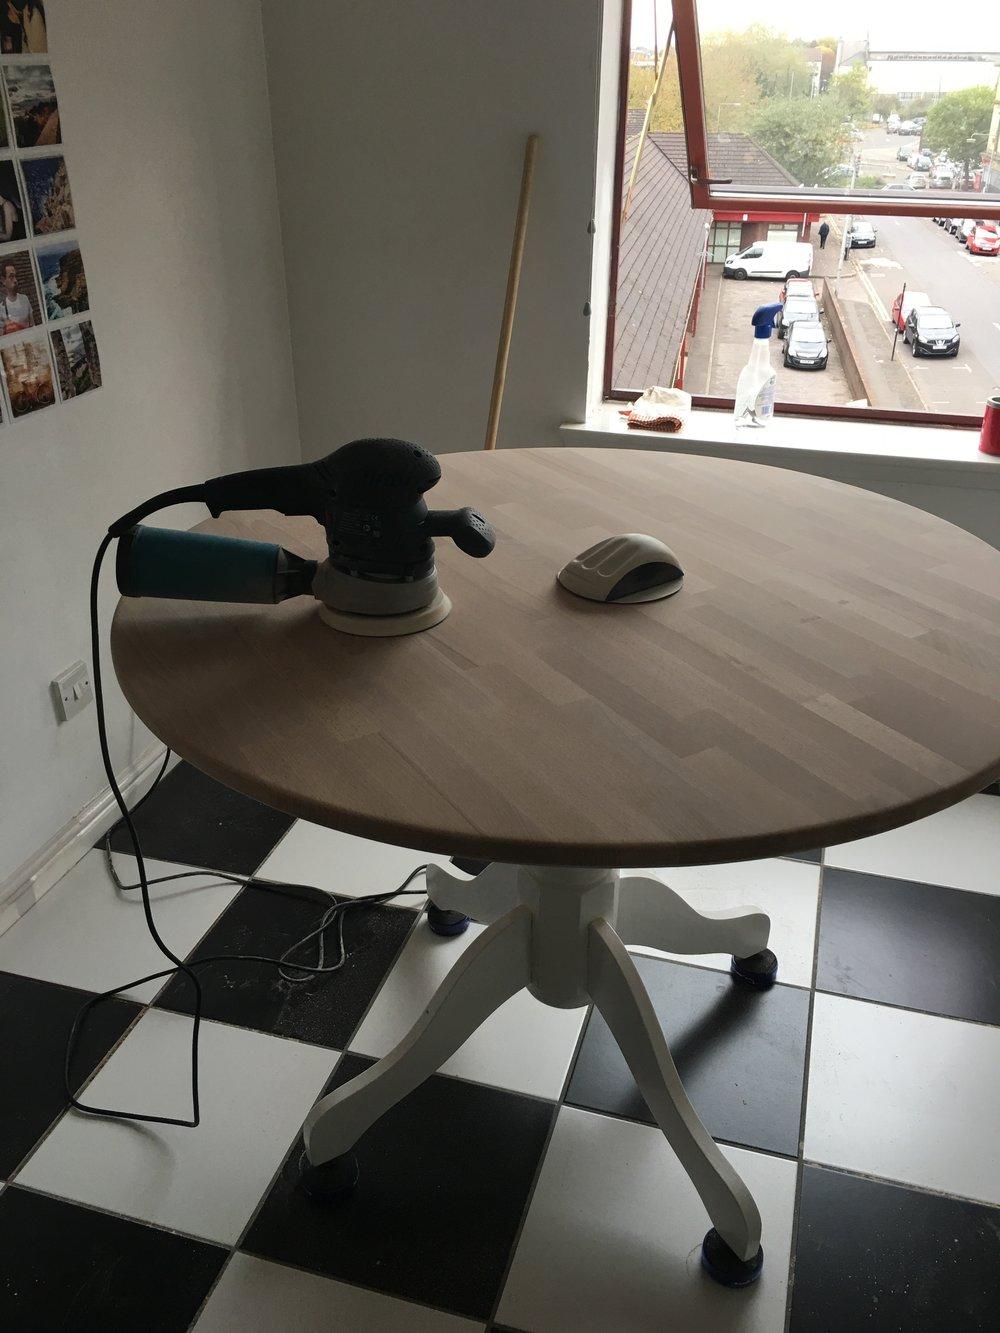 My favourite job of sanding. :(